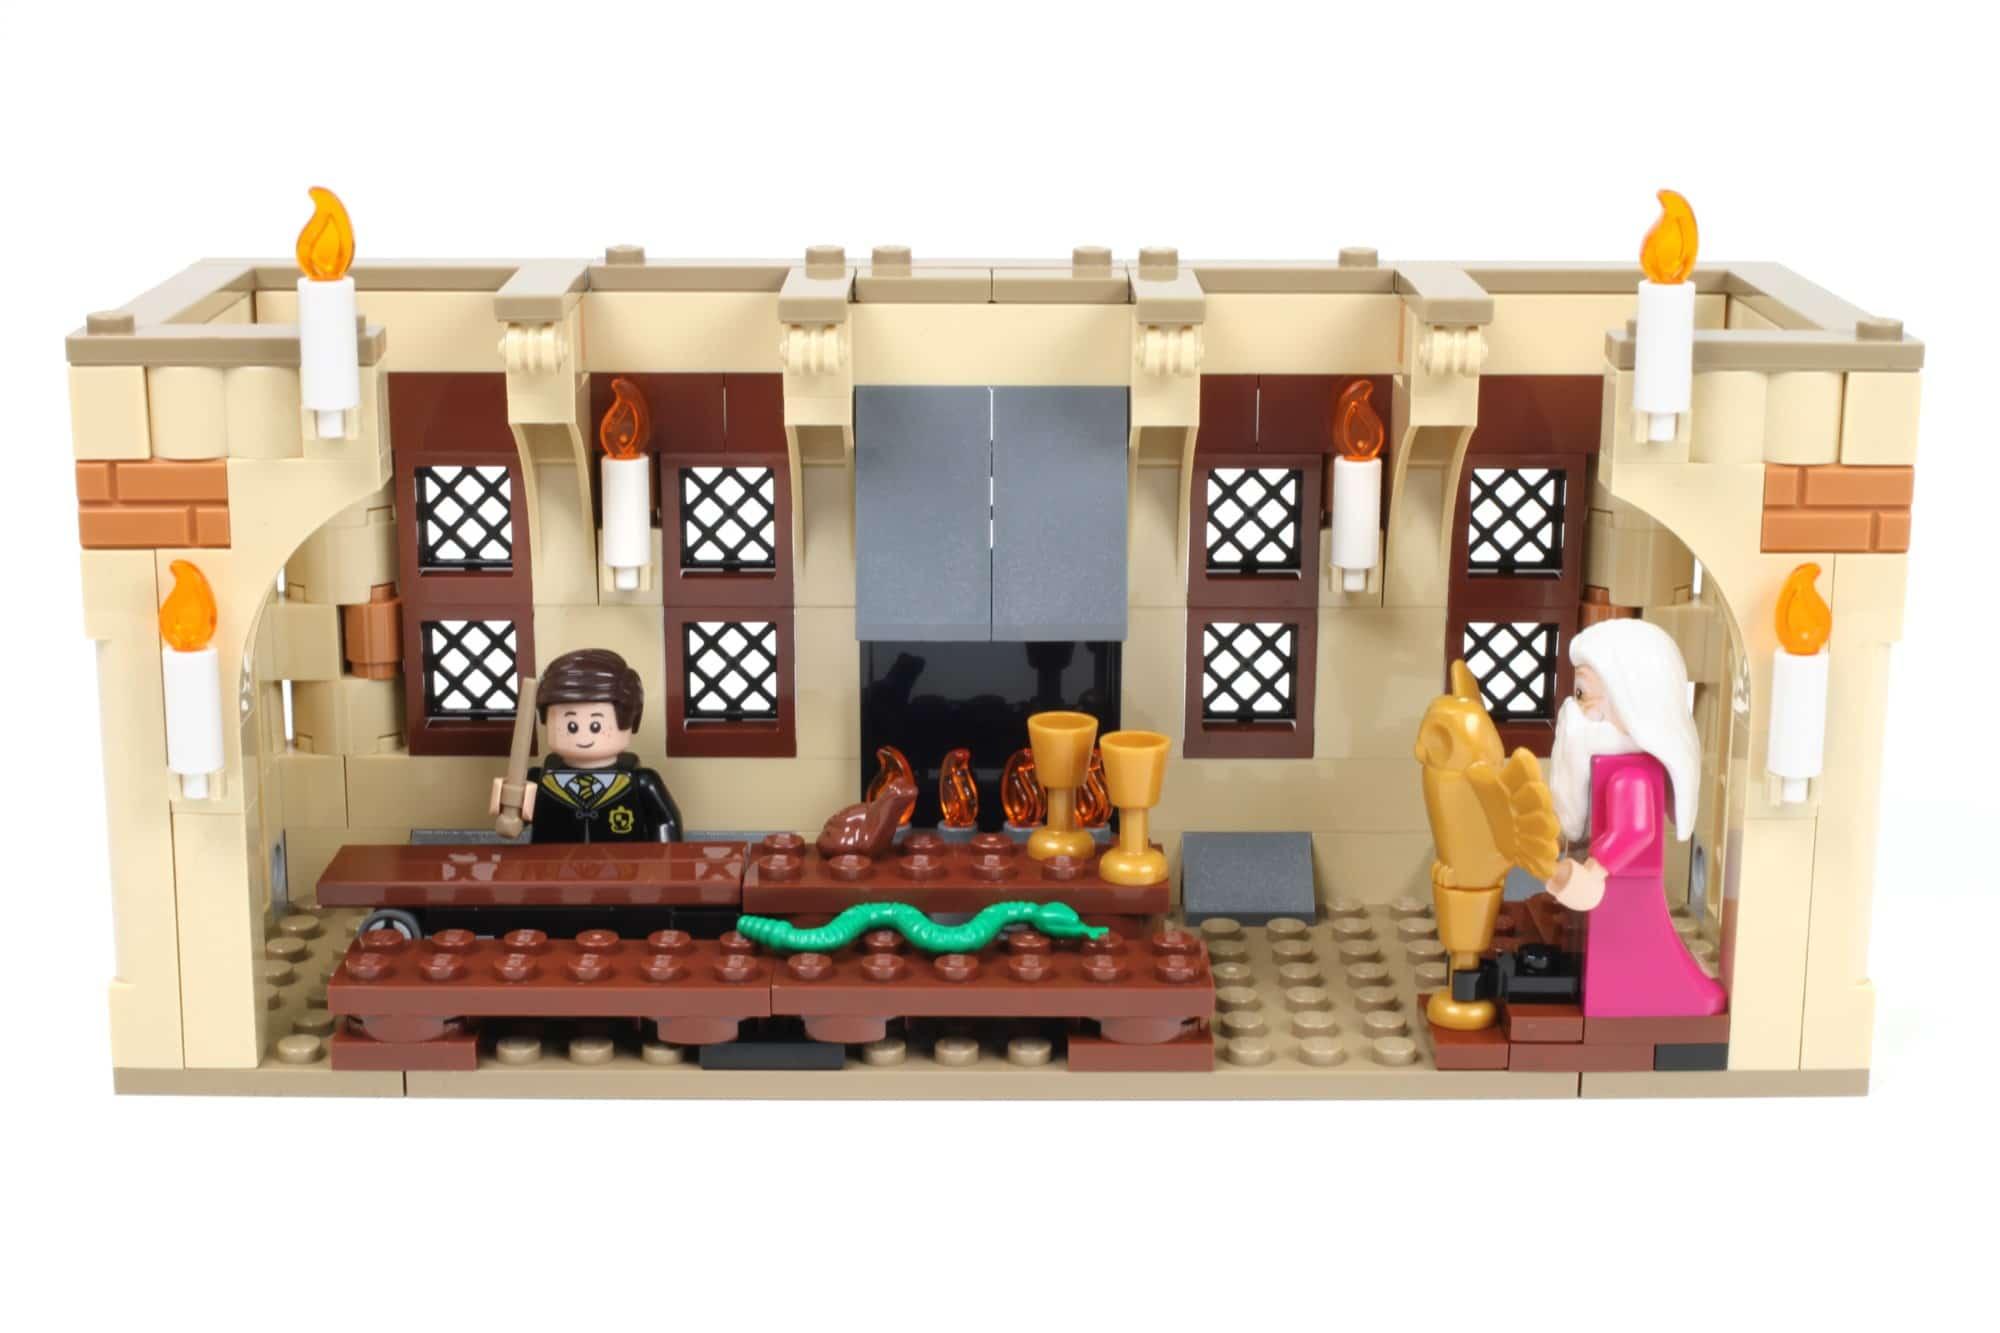 LEGO Harry Potter 76389 Hogwarts Kammer Des Schreckens Schritt 4 2